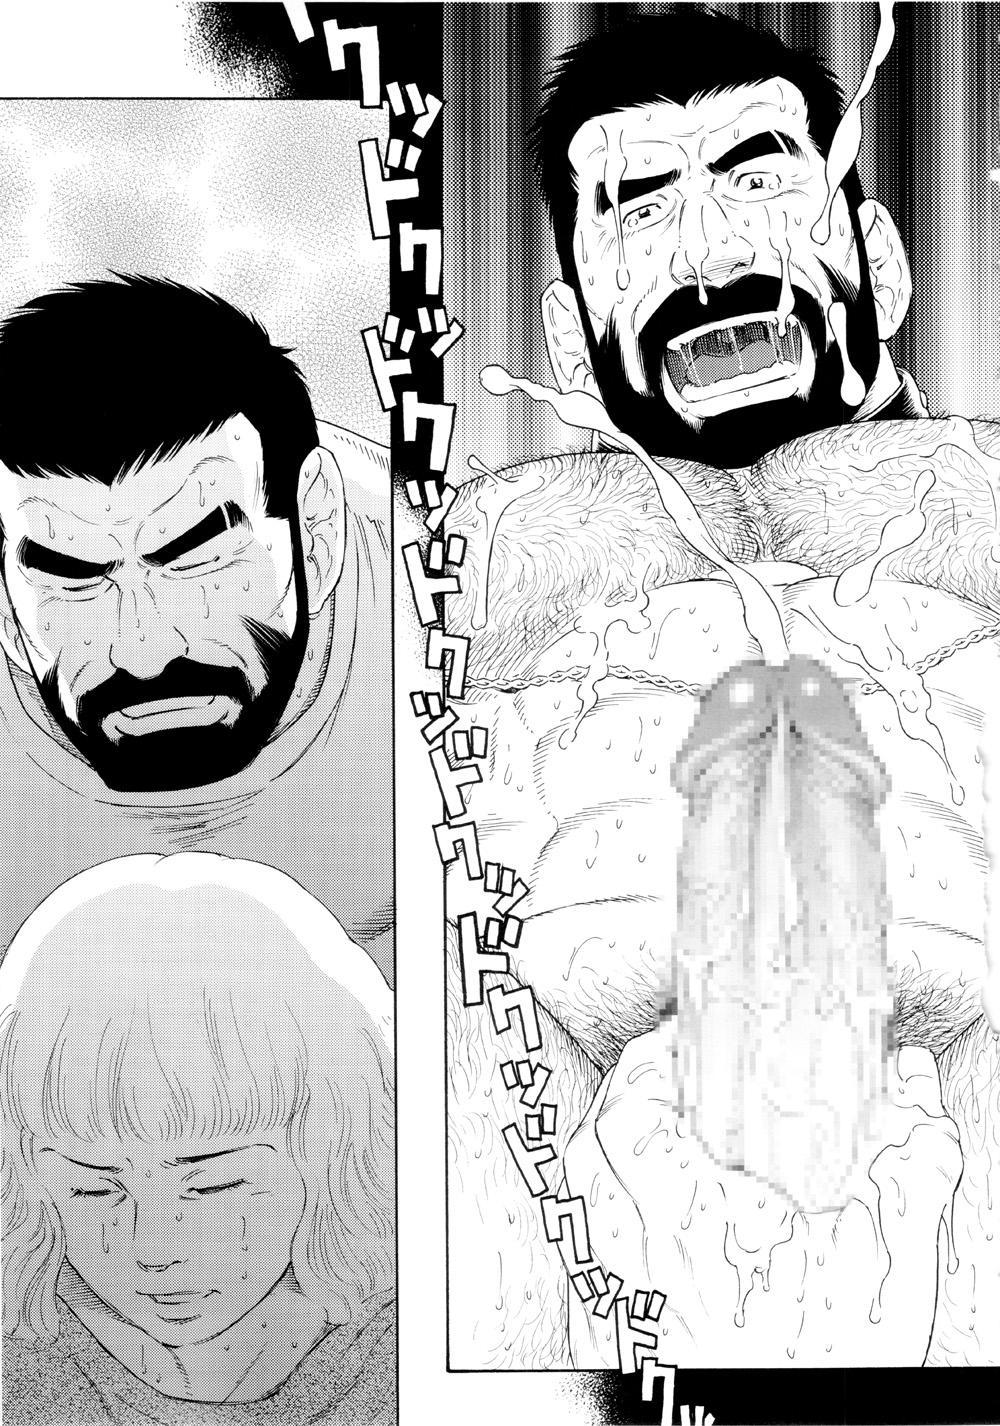 Genryu Chapter 2 10